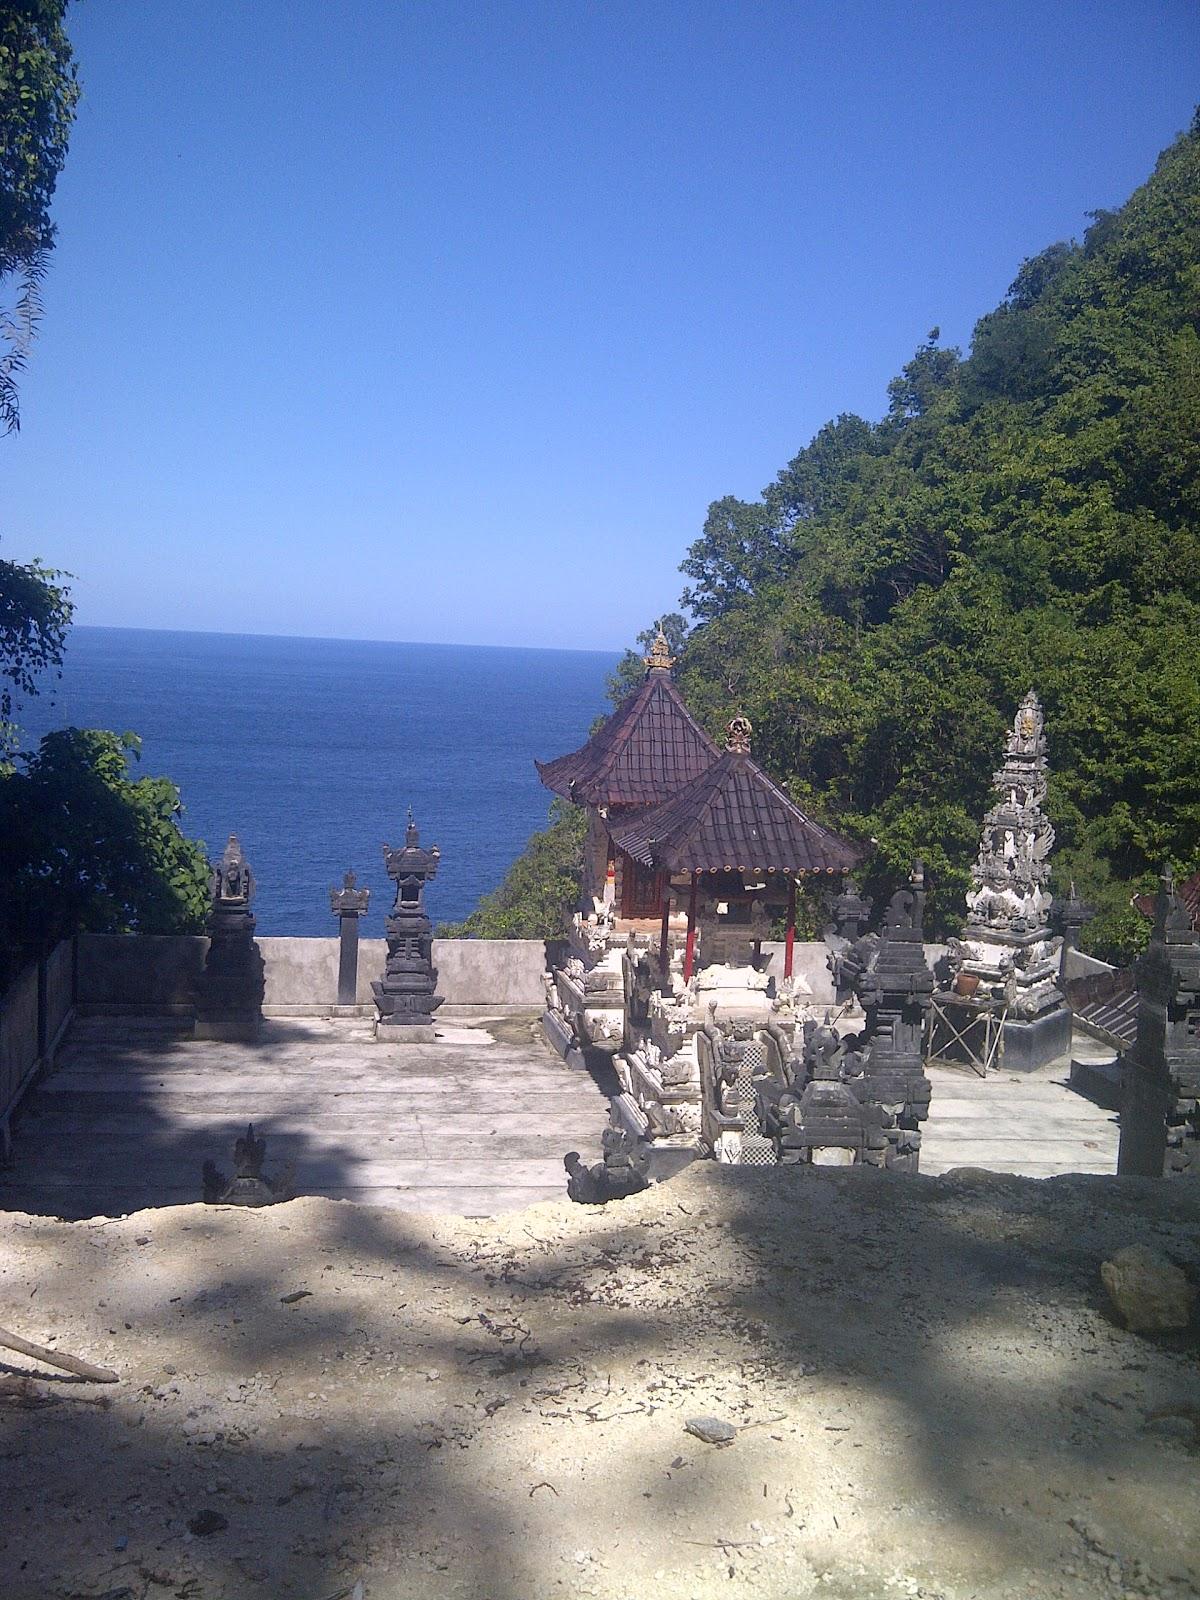 Escape To Nusa Lembongan And Penida Near Bali Wonderful Paket Honeymoon 4 Hari 3 Malam Update 2018 Up In The Mountainous Area Of Hutan Tembeling Village Batumadeg Lies A Long Strip Pristine Forest Meandering Down Towards Sea Where